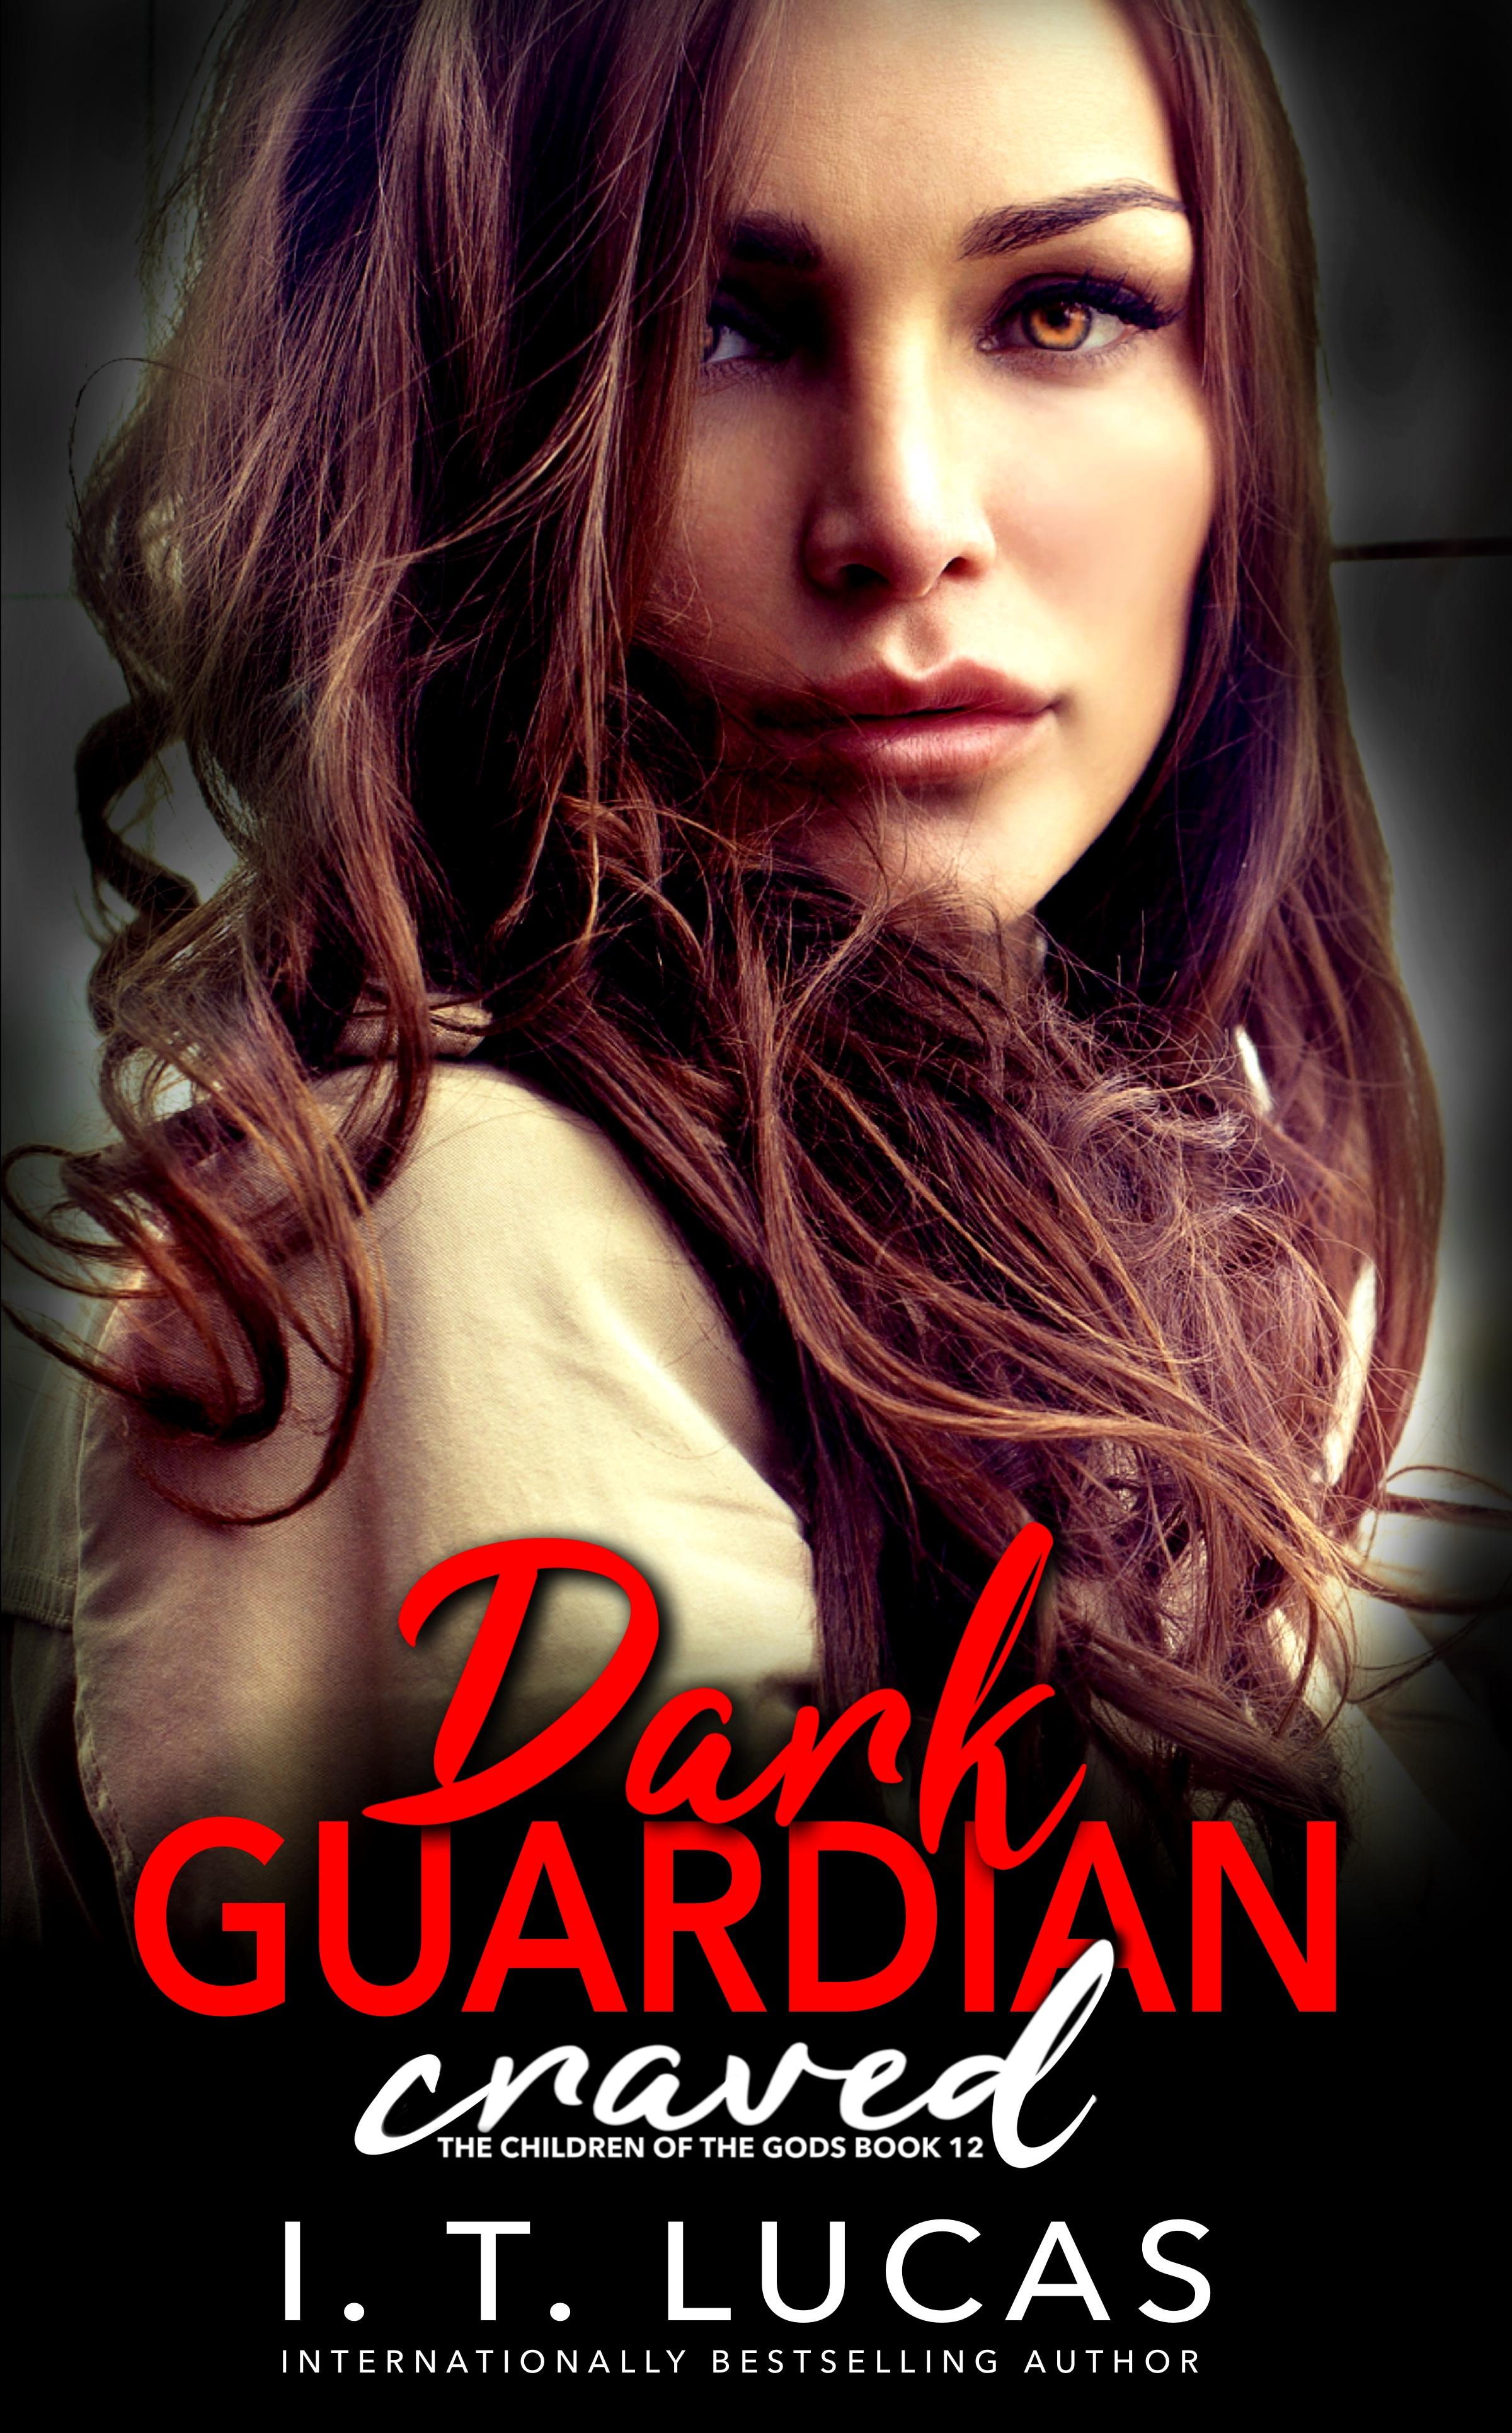 Dark Guardian Craved (Children of the Gods #12)